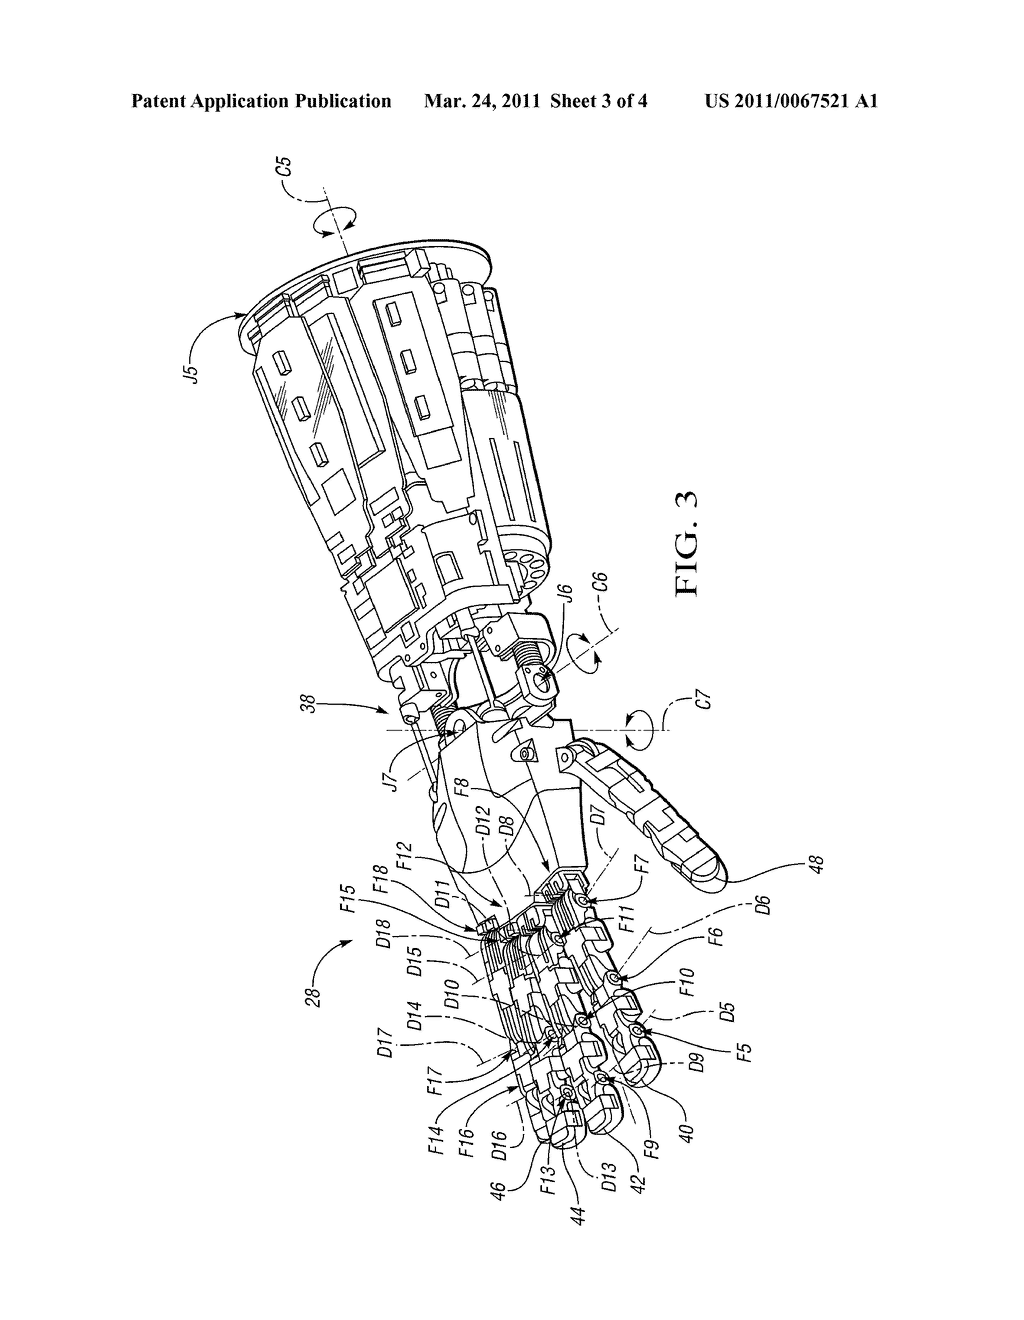 Robot Arm Patent